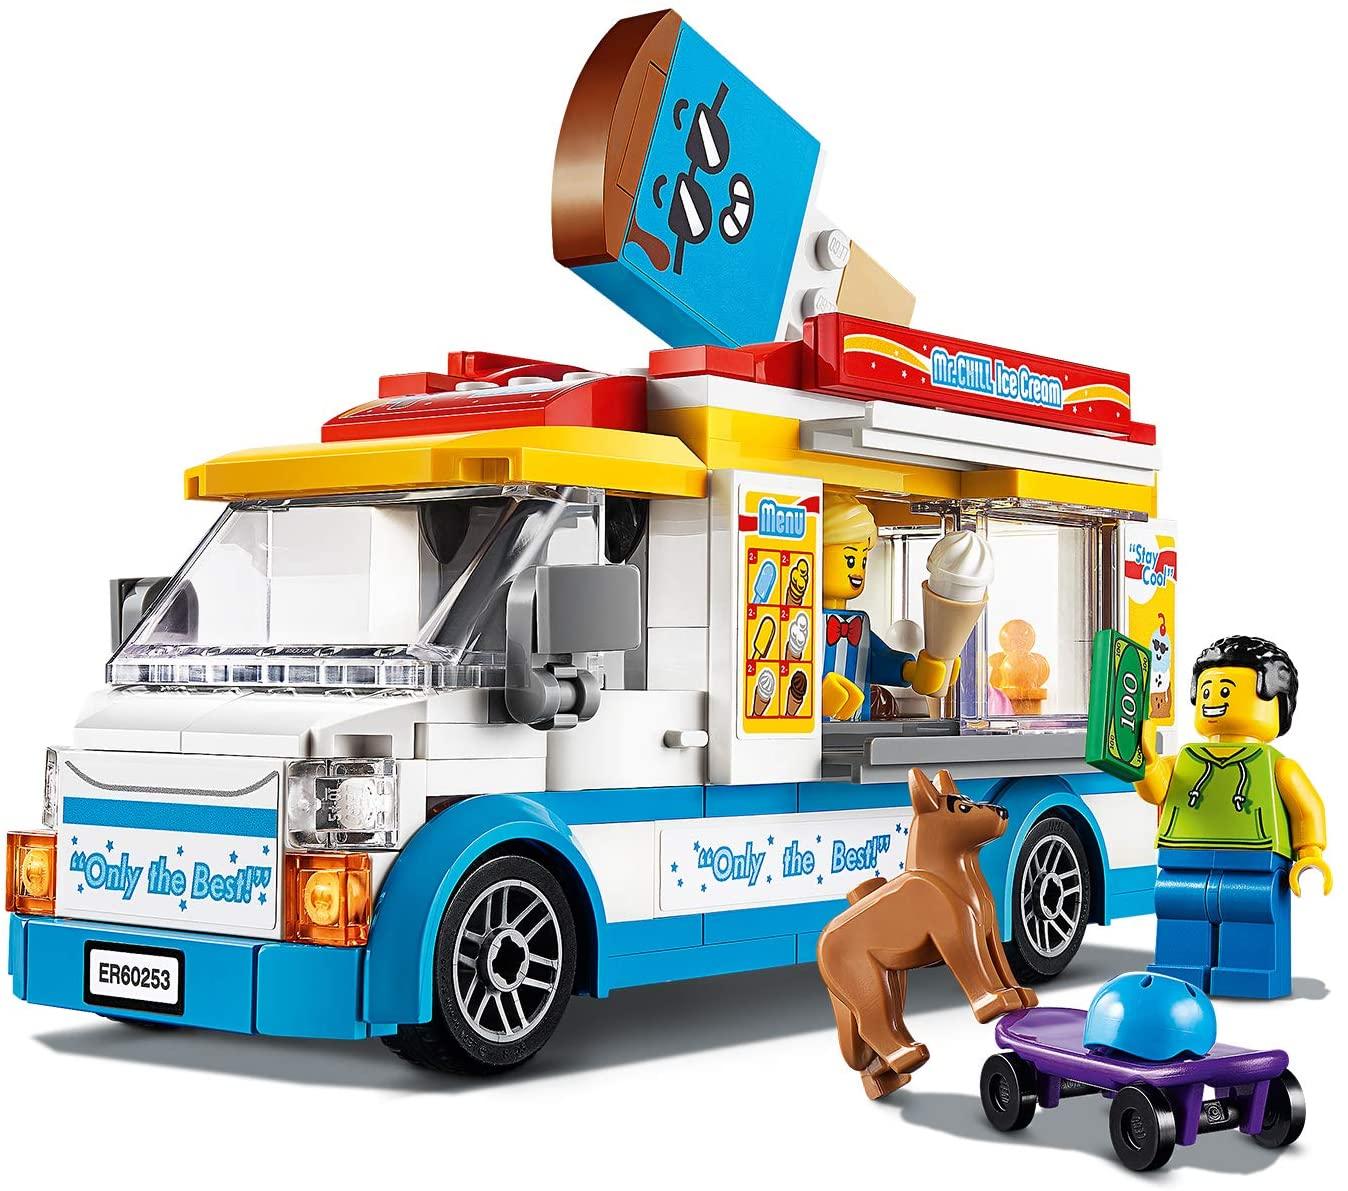 Ice-Cream Truck Set